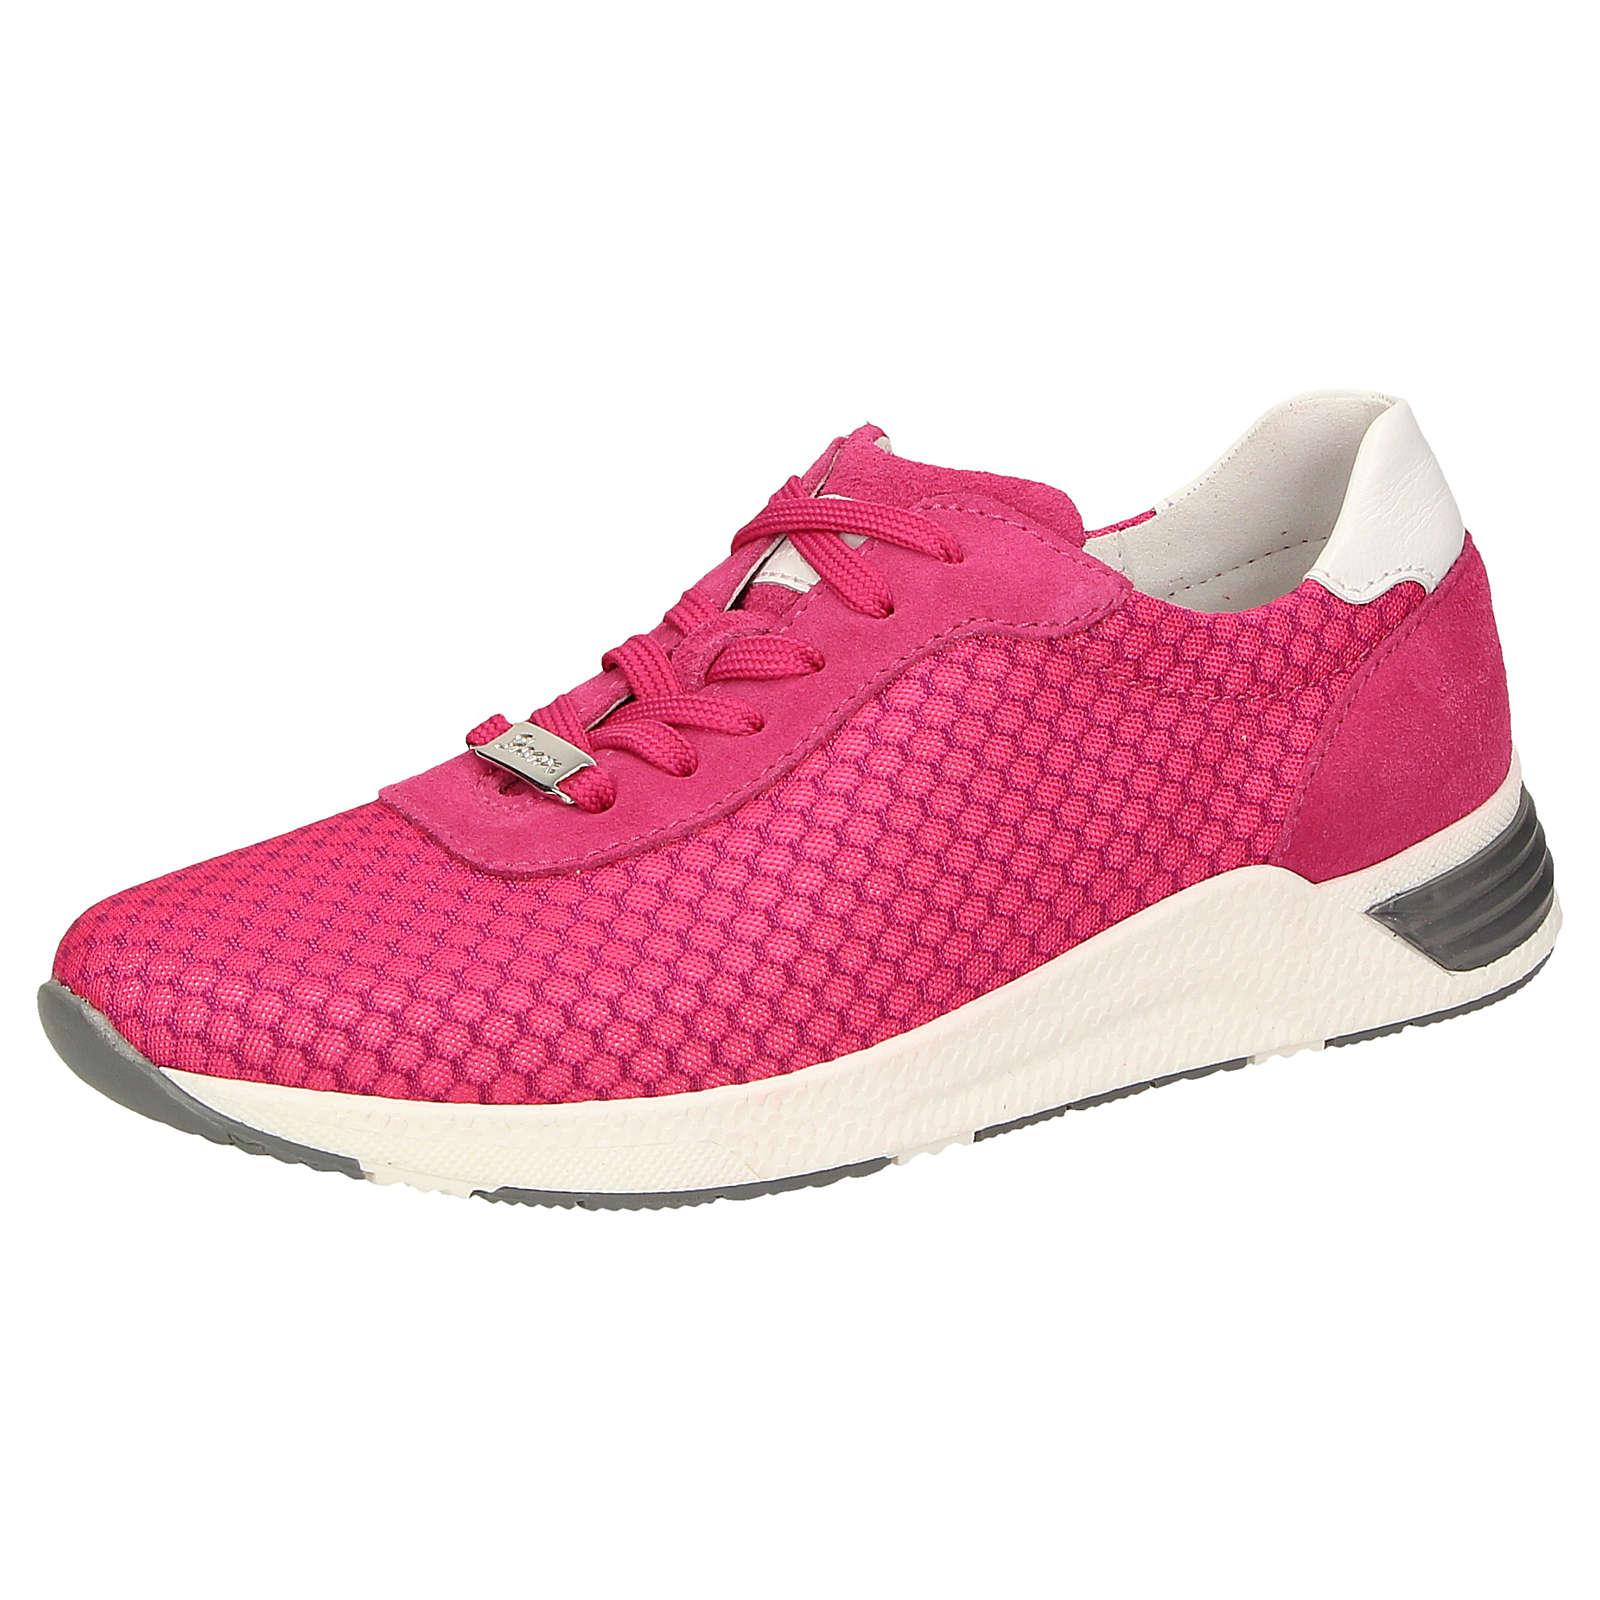 Sioux Sneaker Natovia-700 Sneakers Low pink Damen Gr. 38